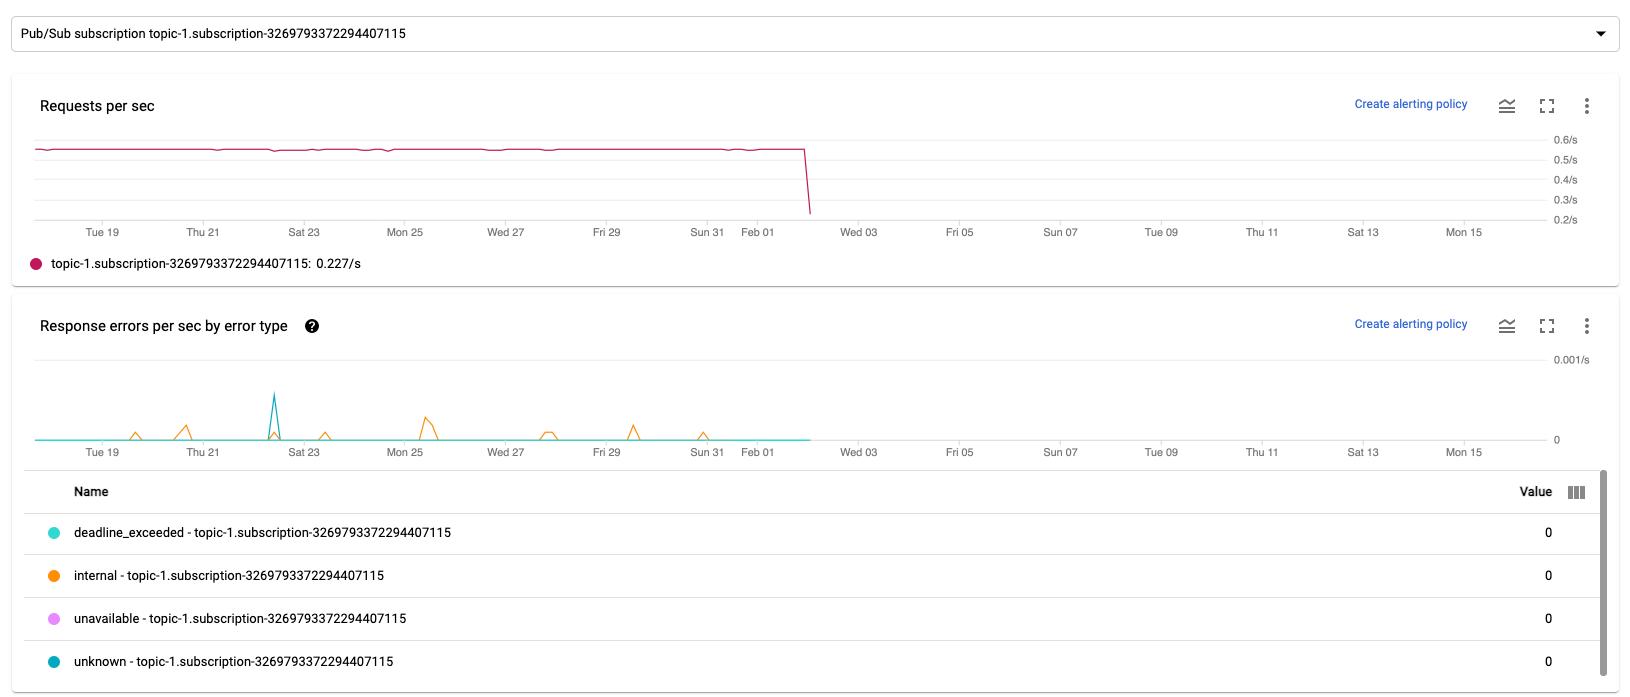 Dataflow ストリーミング ジョブの入力と出力の指標を示す一連のグラフ。